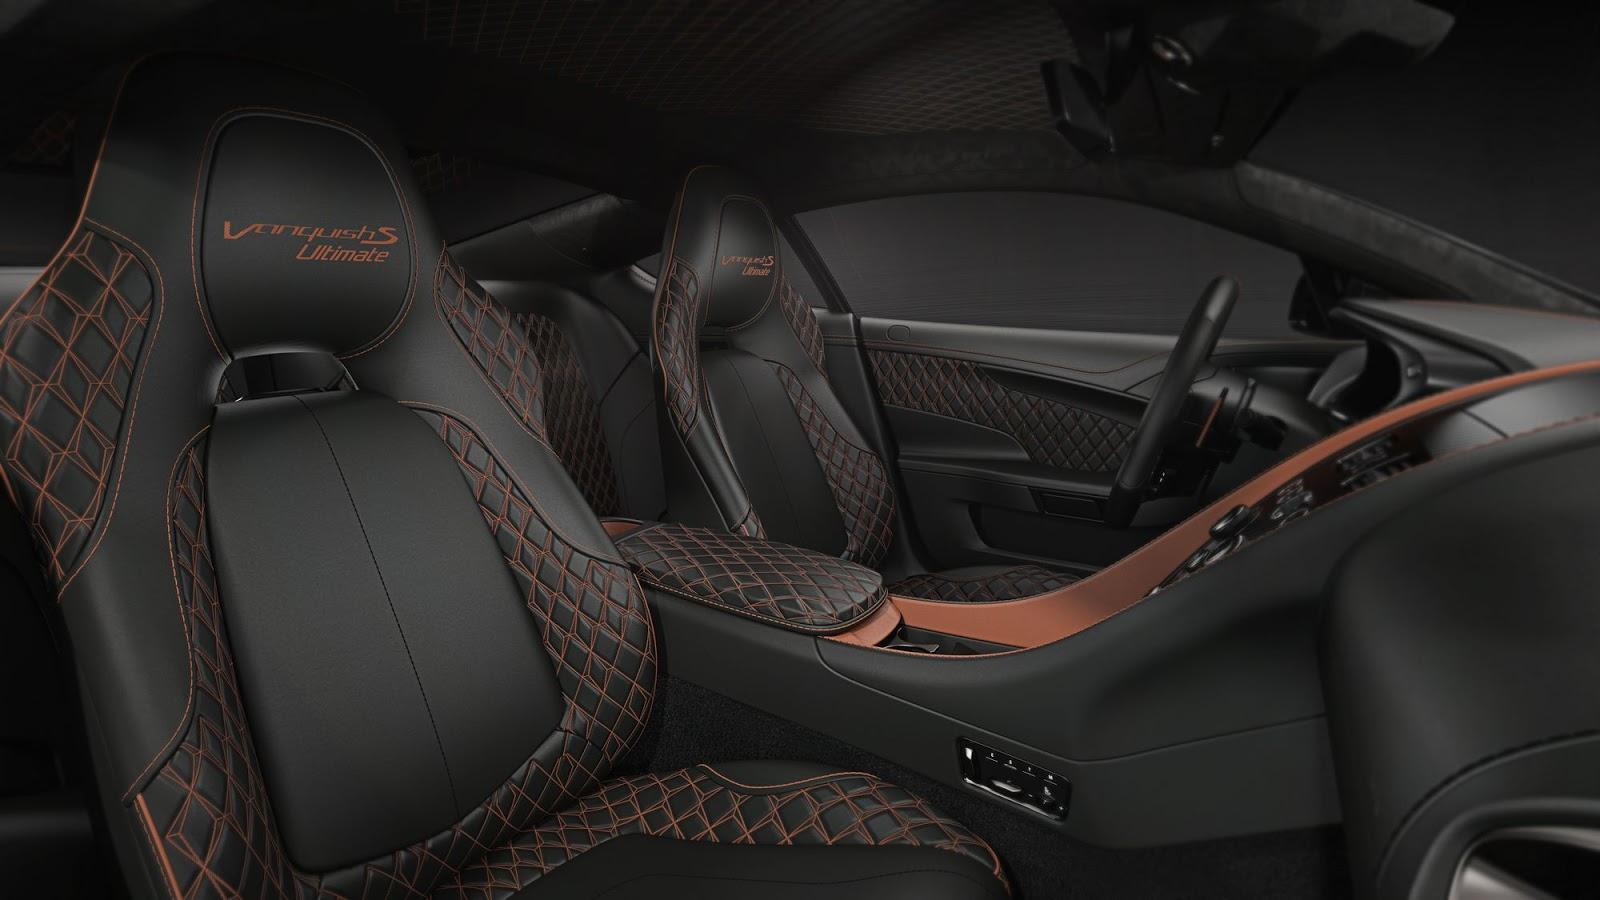 Aston-Martin-Vanquish-S-Ultimate-3